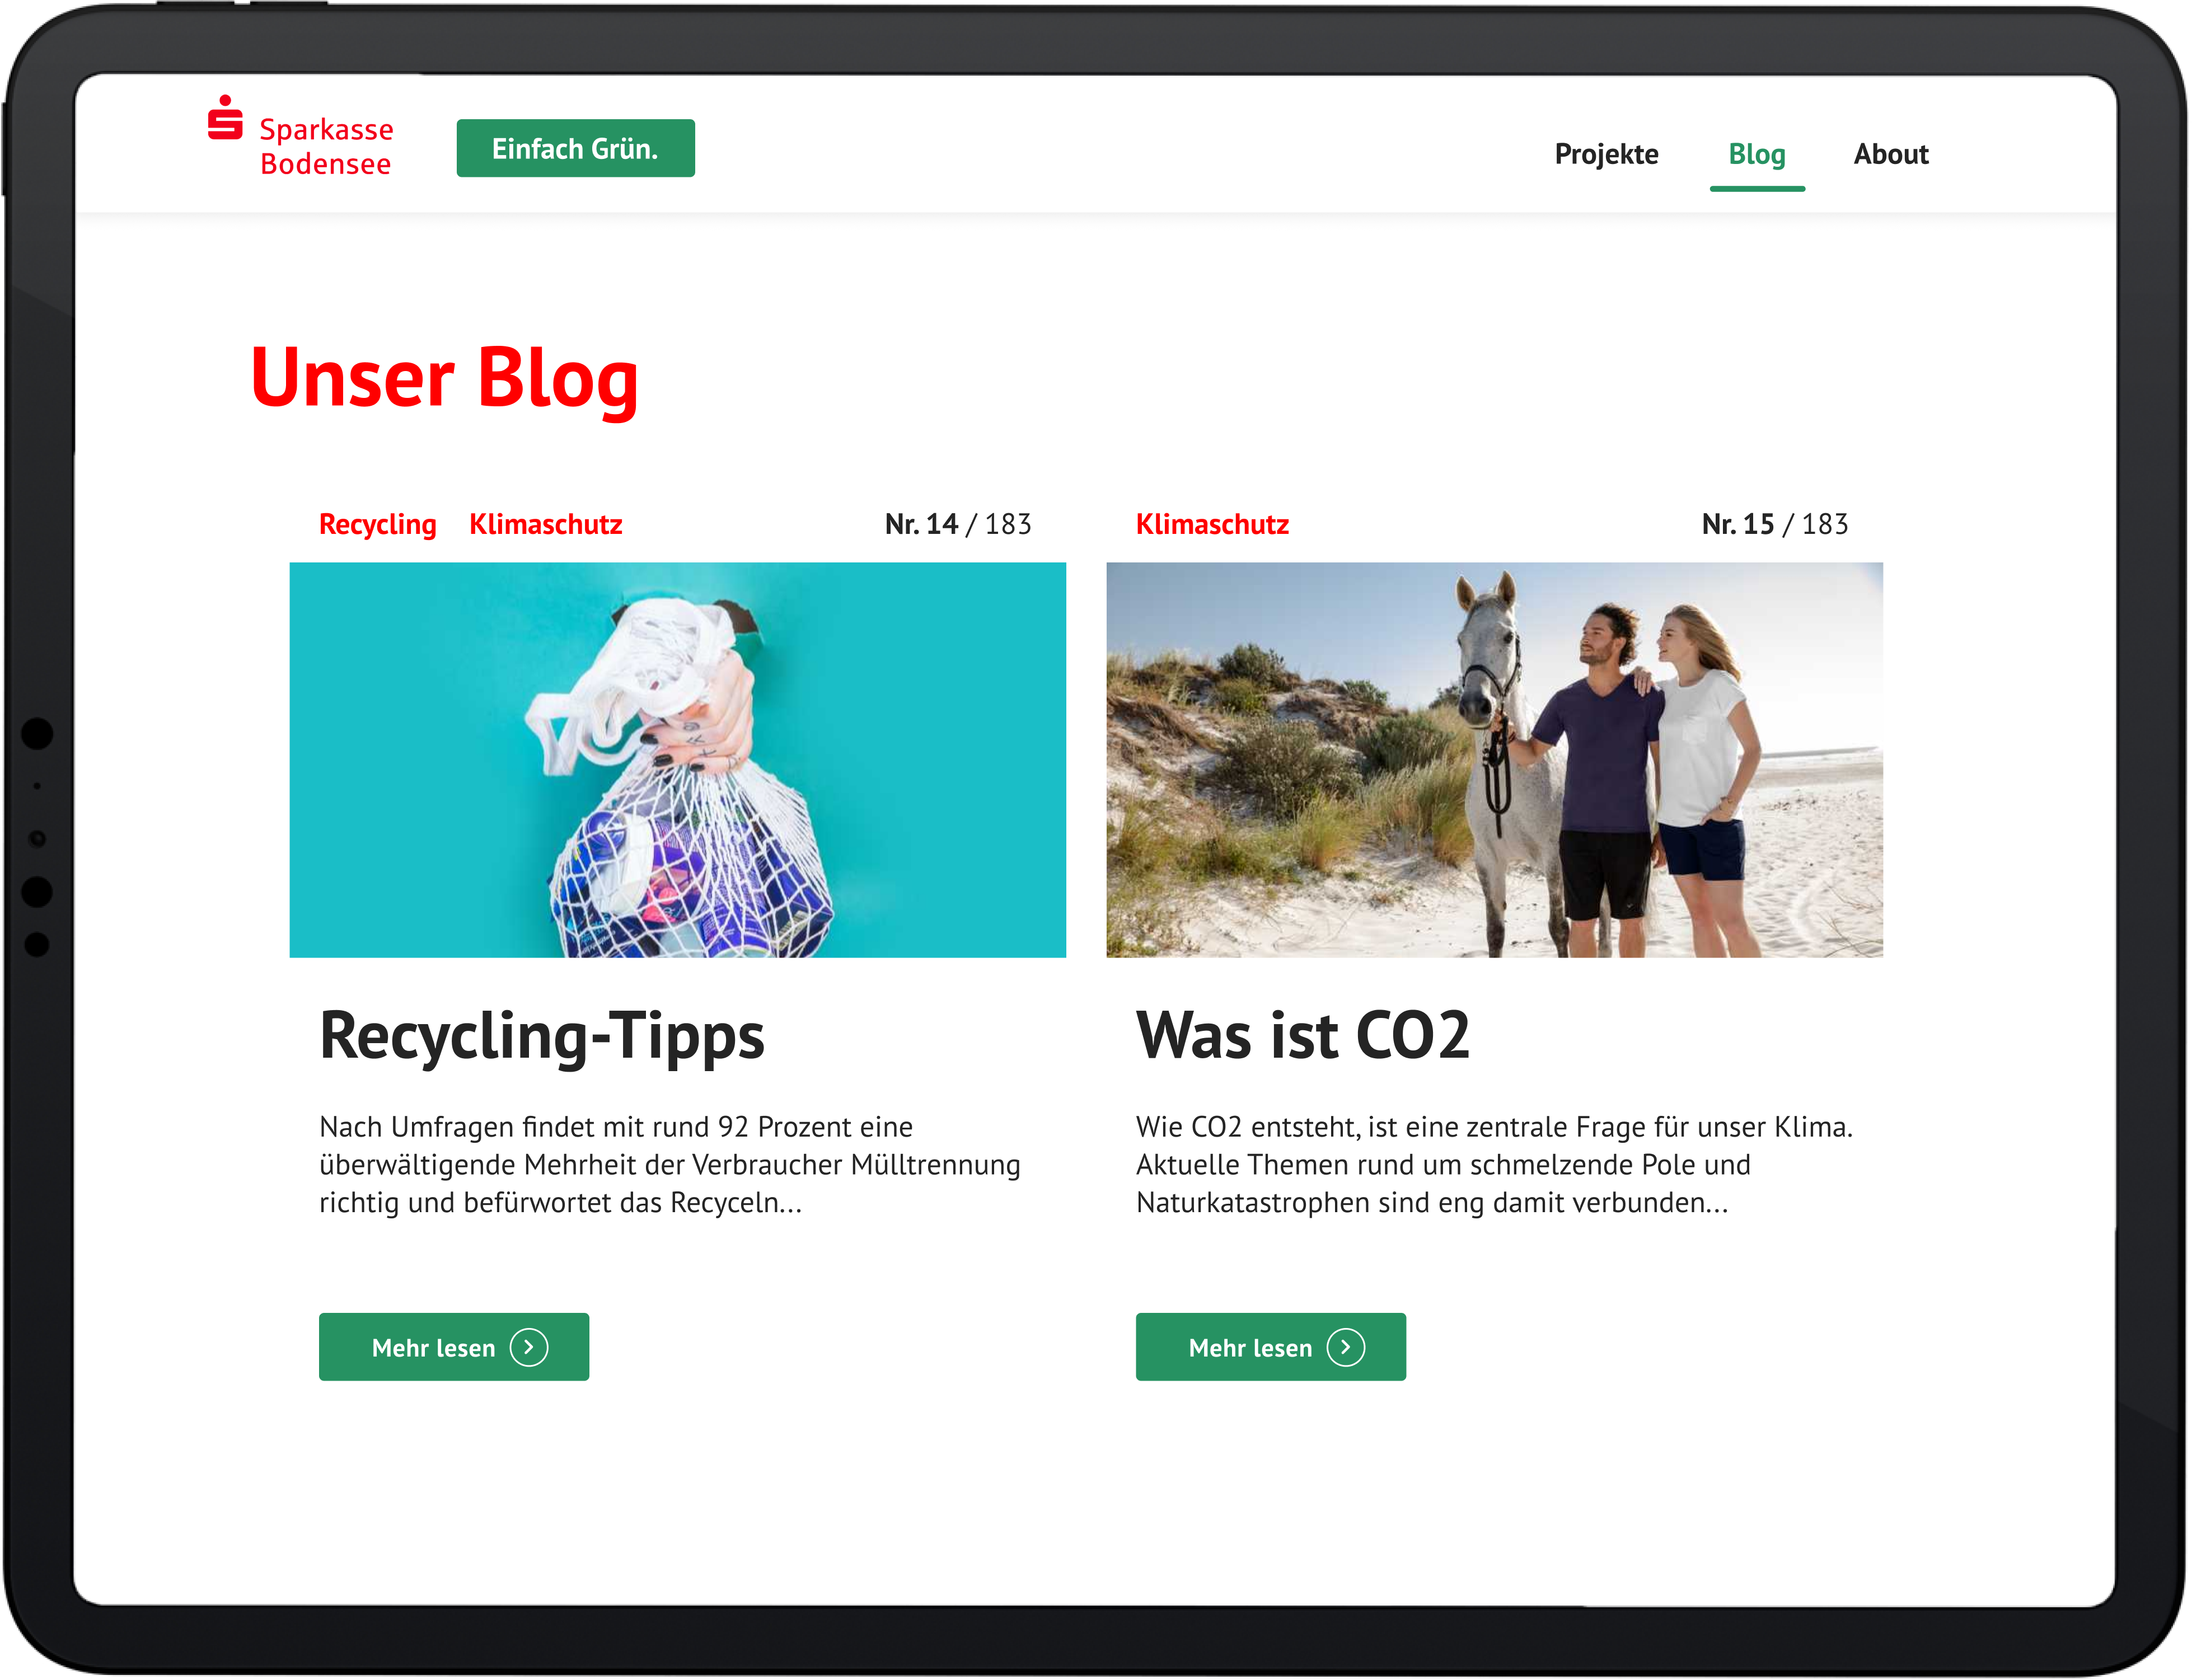 Sparkasse Bodensee Nachhaltigkeitsplattform - Mockup Nachhaltigkeitsblog